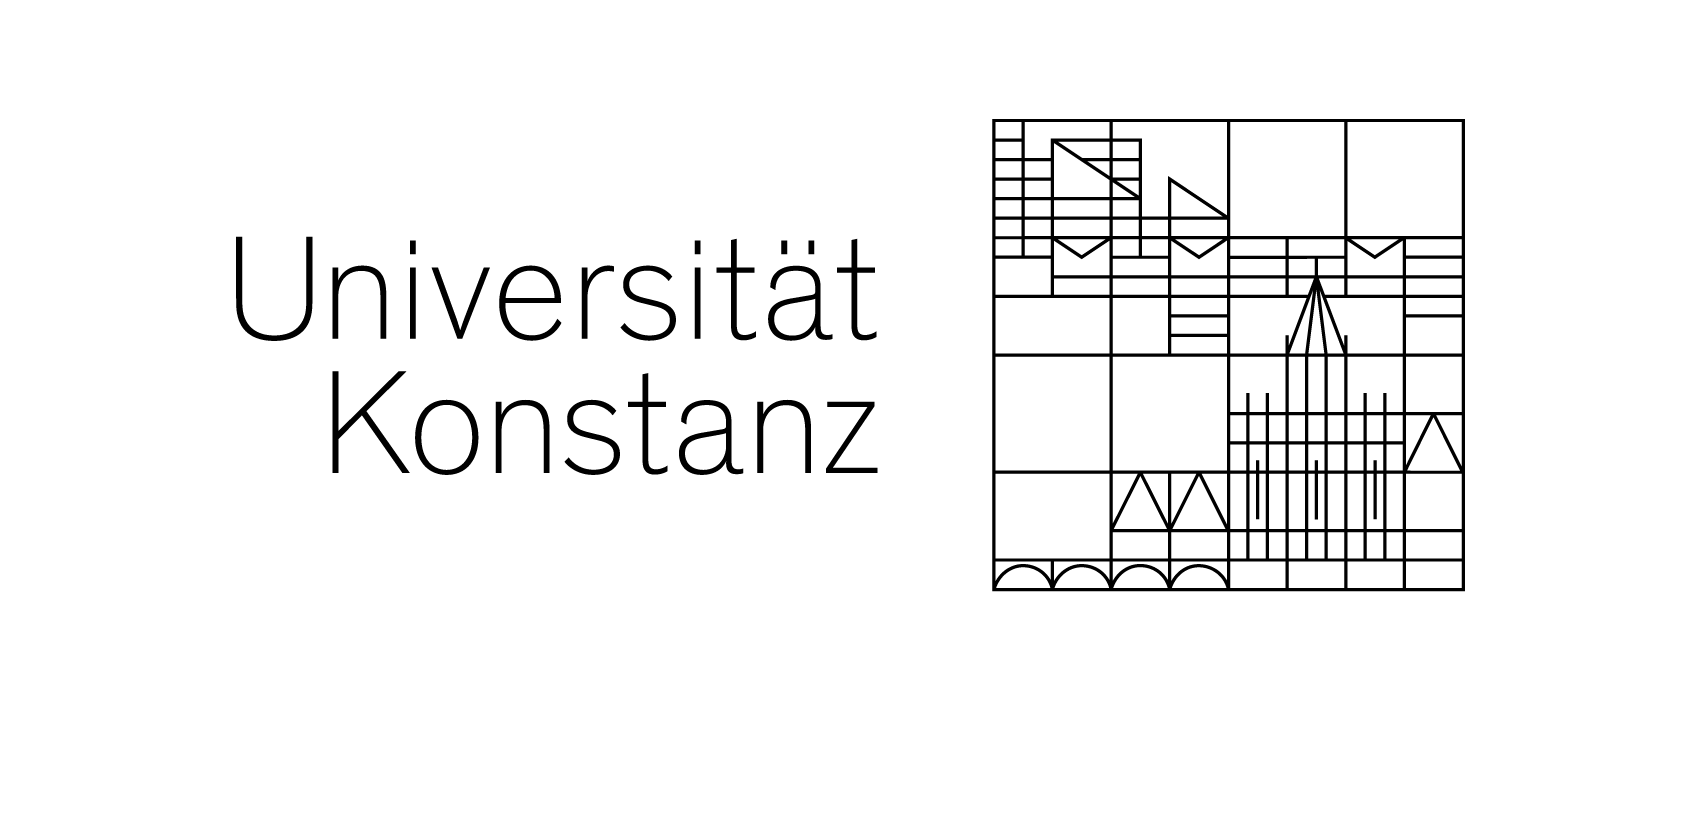 unikonstanz_logo_minimum_srgb